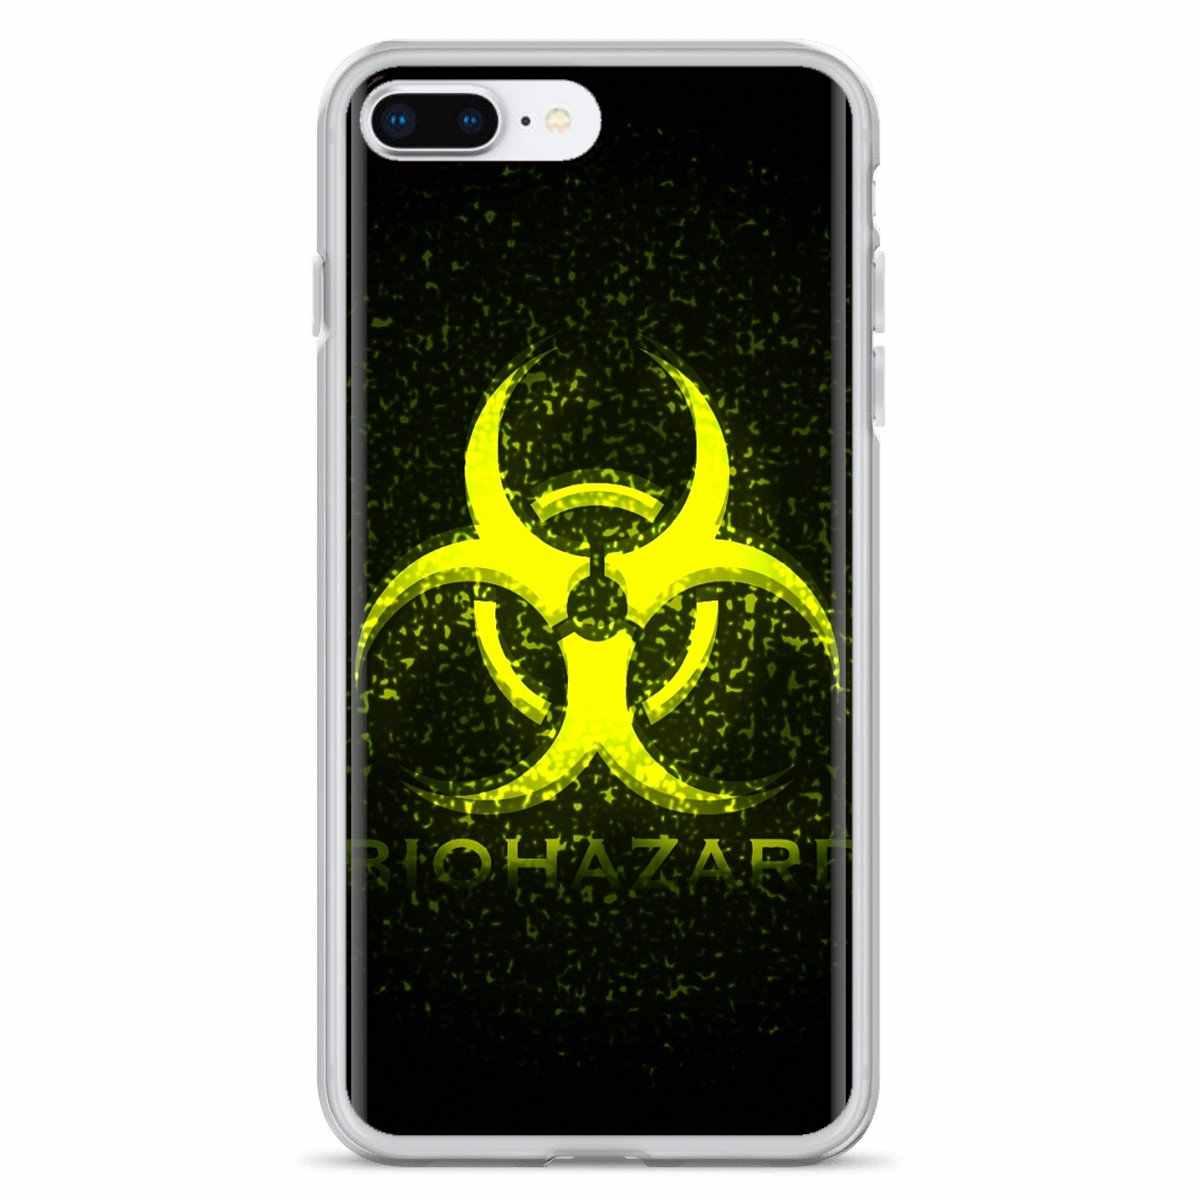 Sci Fi Biohazard 로고 삼성 갤럭시 A3 A5 A7 A9 A8 스타 라이트 A6 플러스 2018 2015 2016 2017 포스터 실리콘 전화 케이스